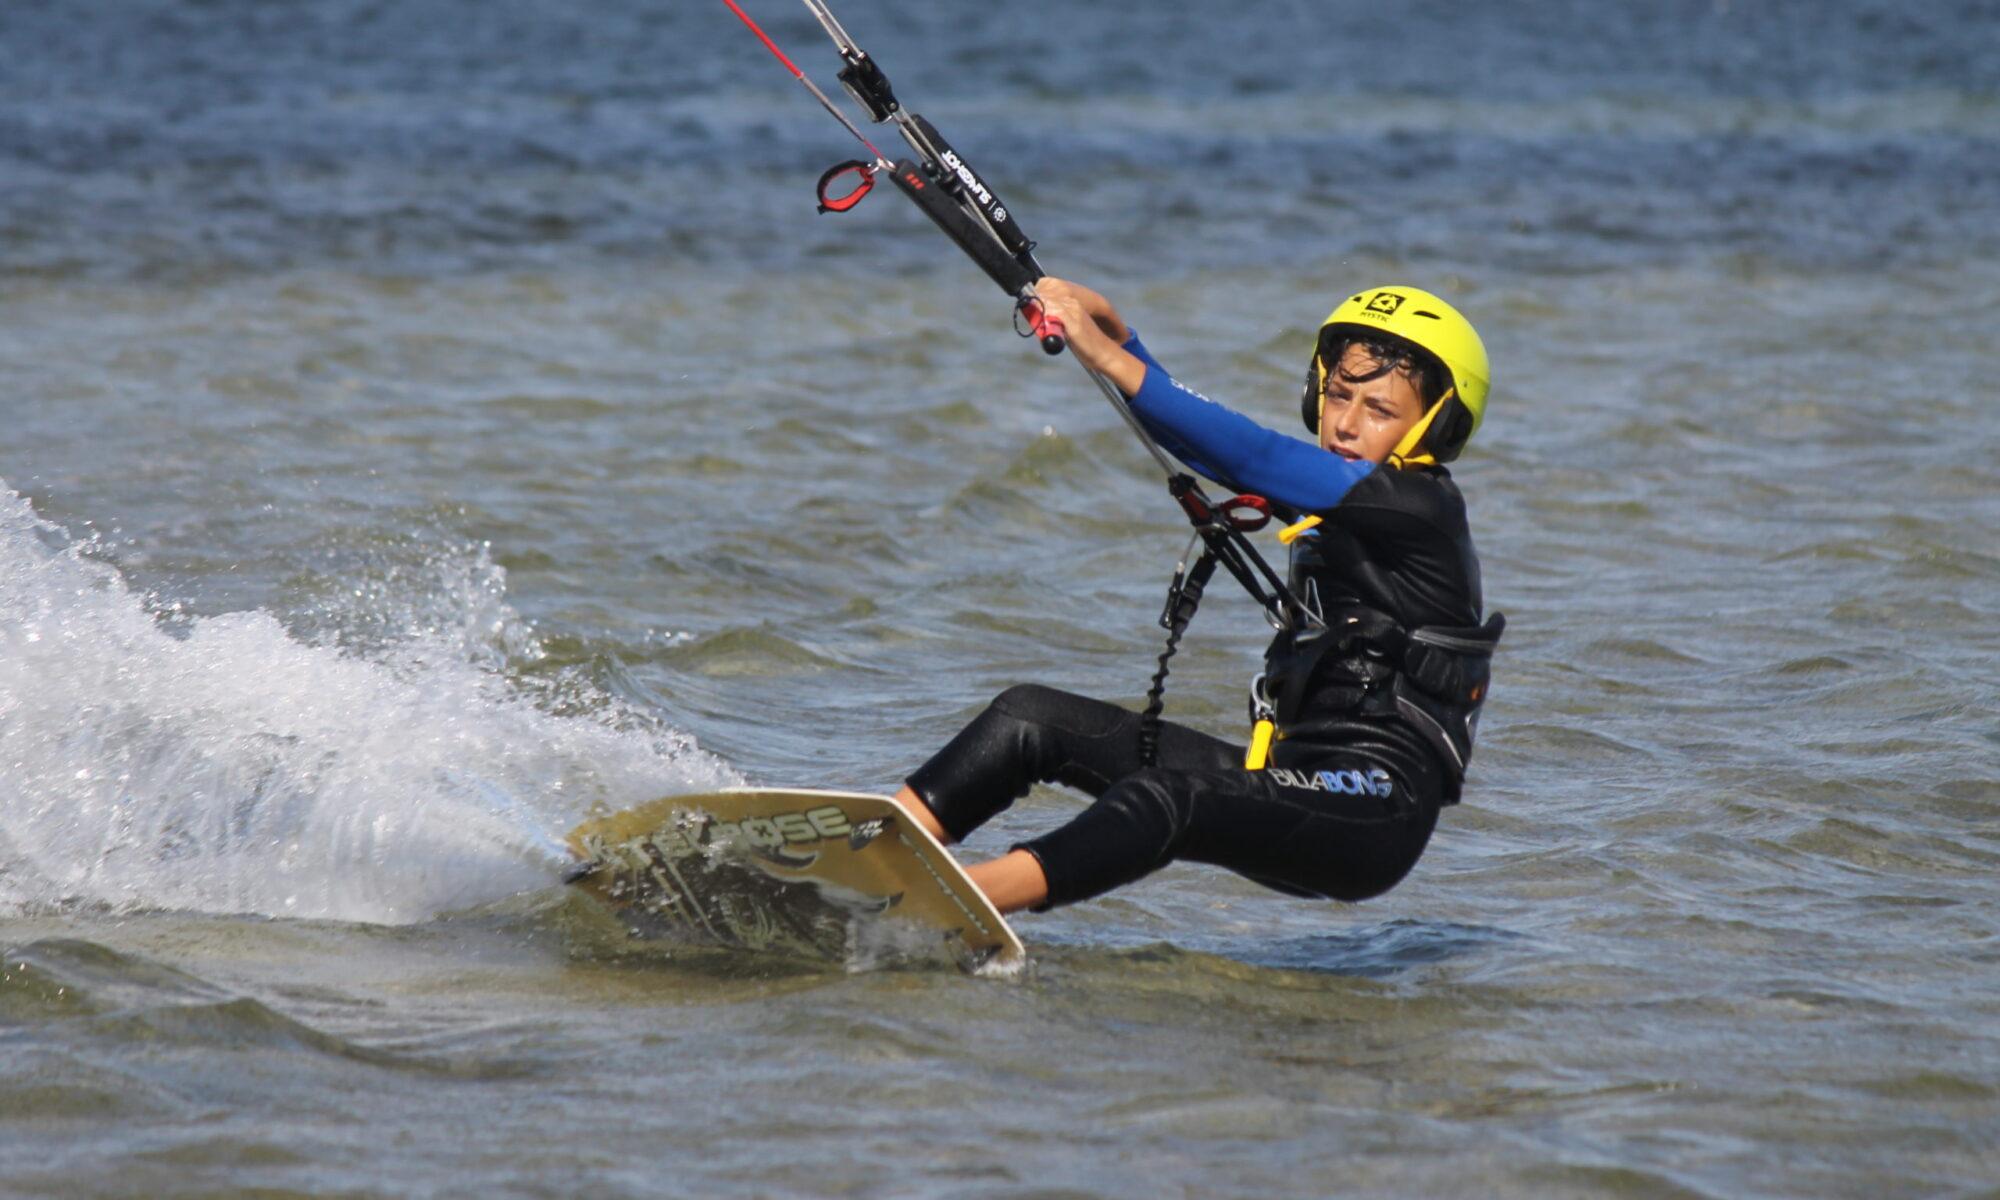 Corso kitesurf per bambini a Punta Trettu in Sardegna, il paradiso del kitesurf